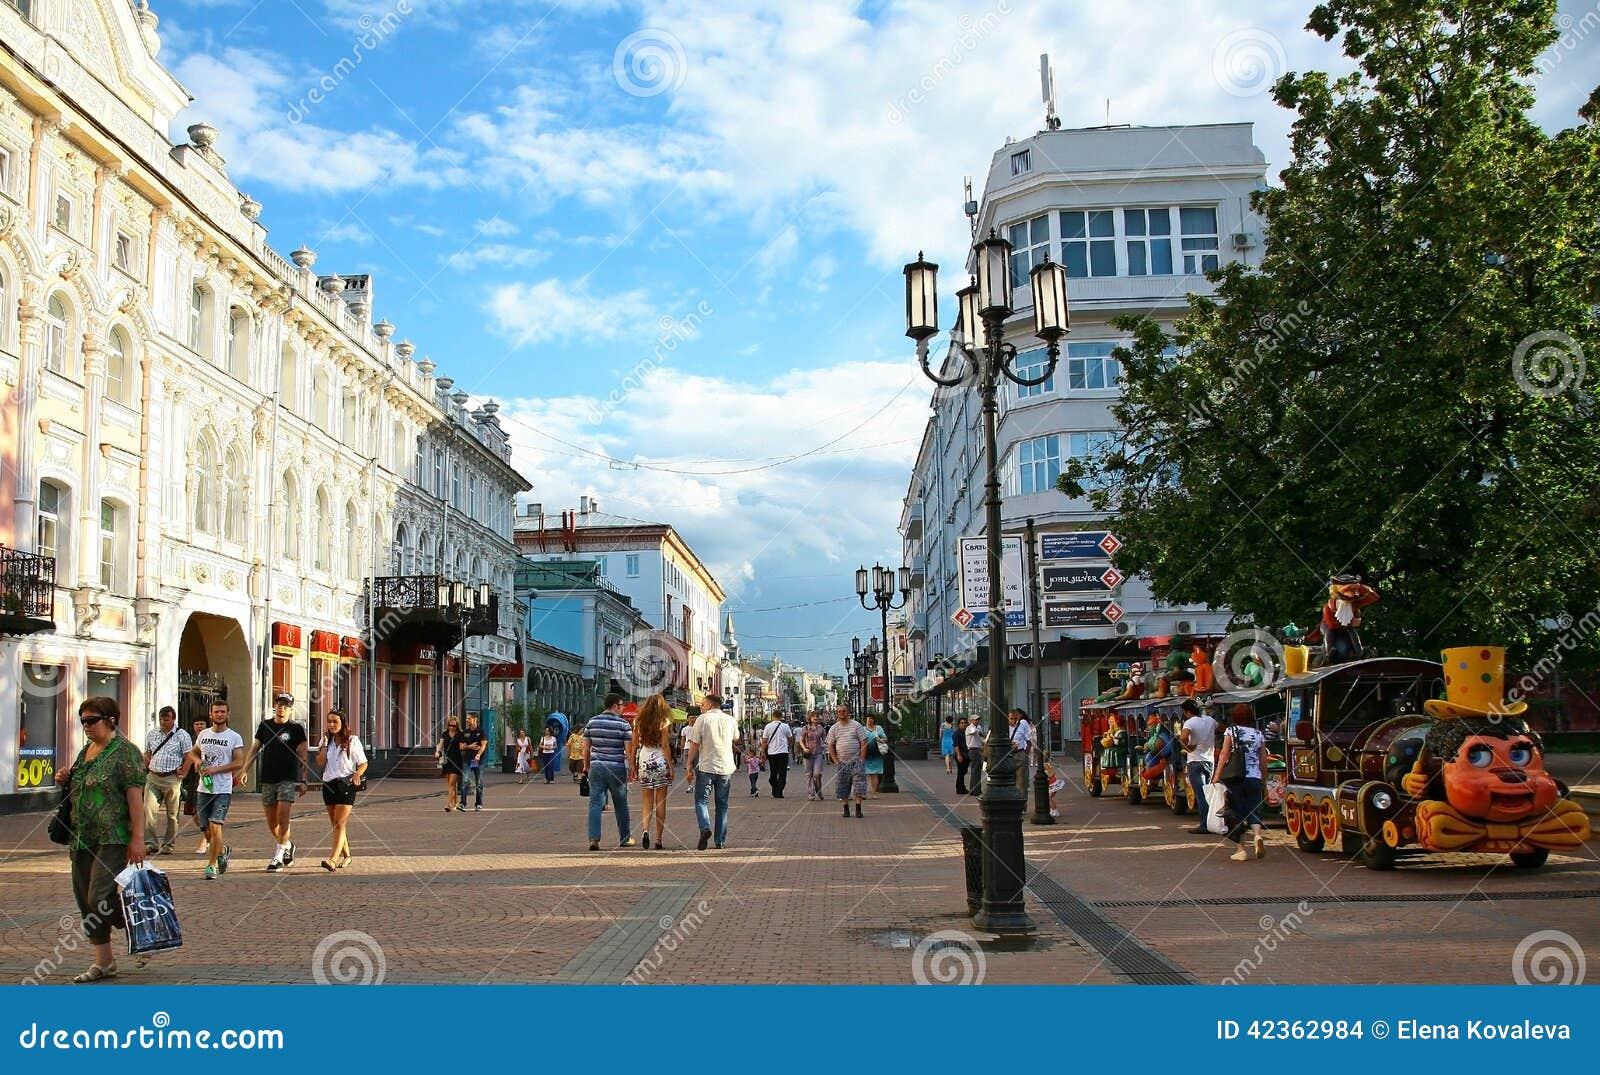 In 2014, in Nizhny Novgorod roads will invest twice as much finance 15